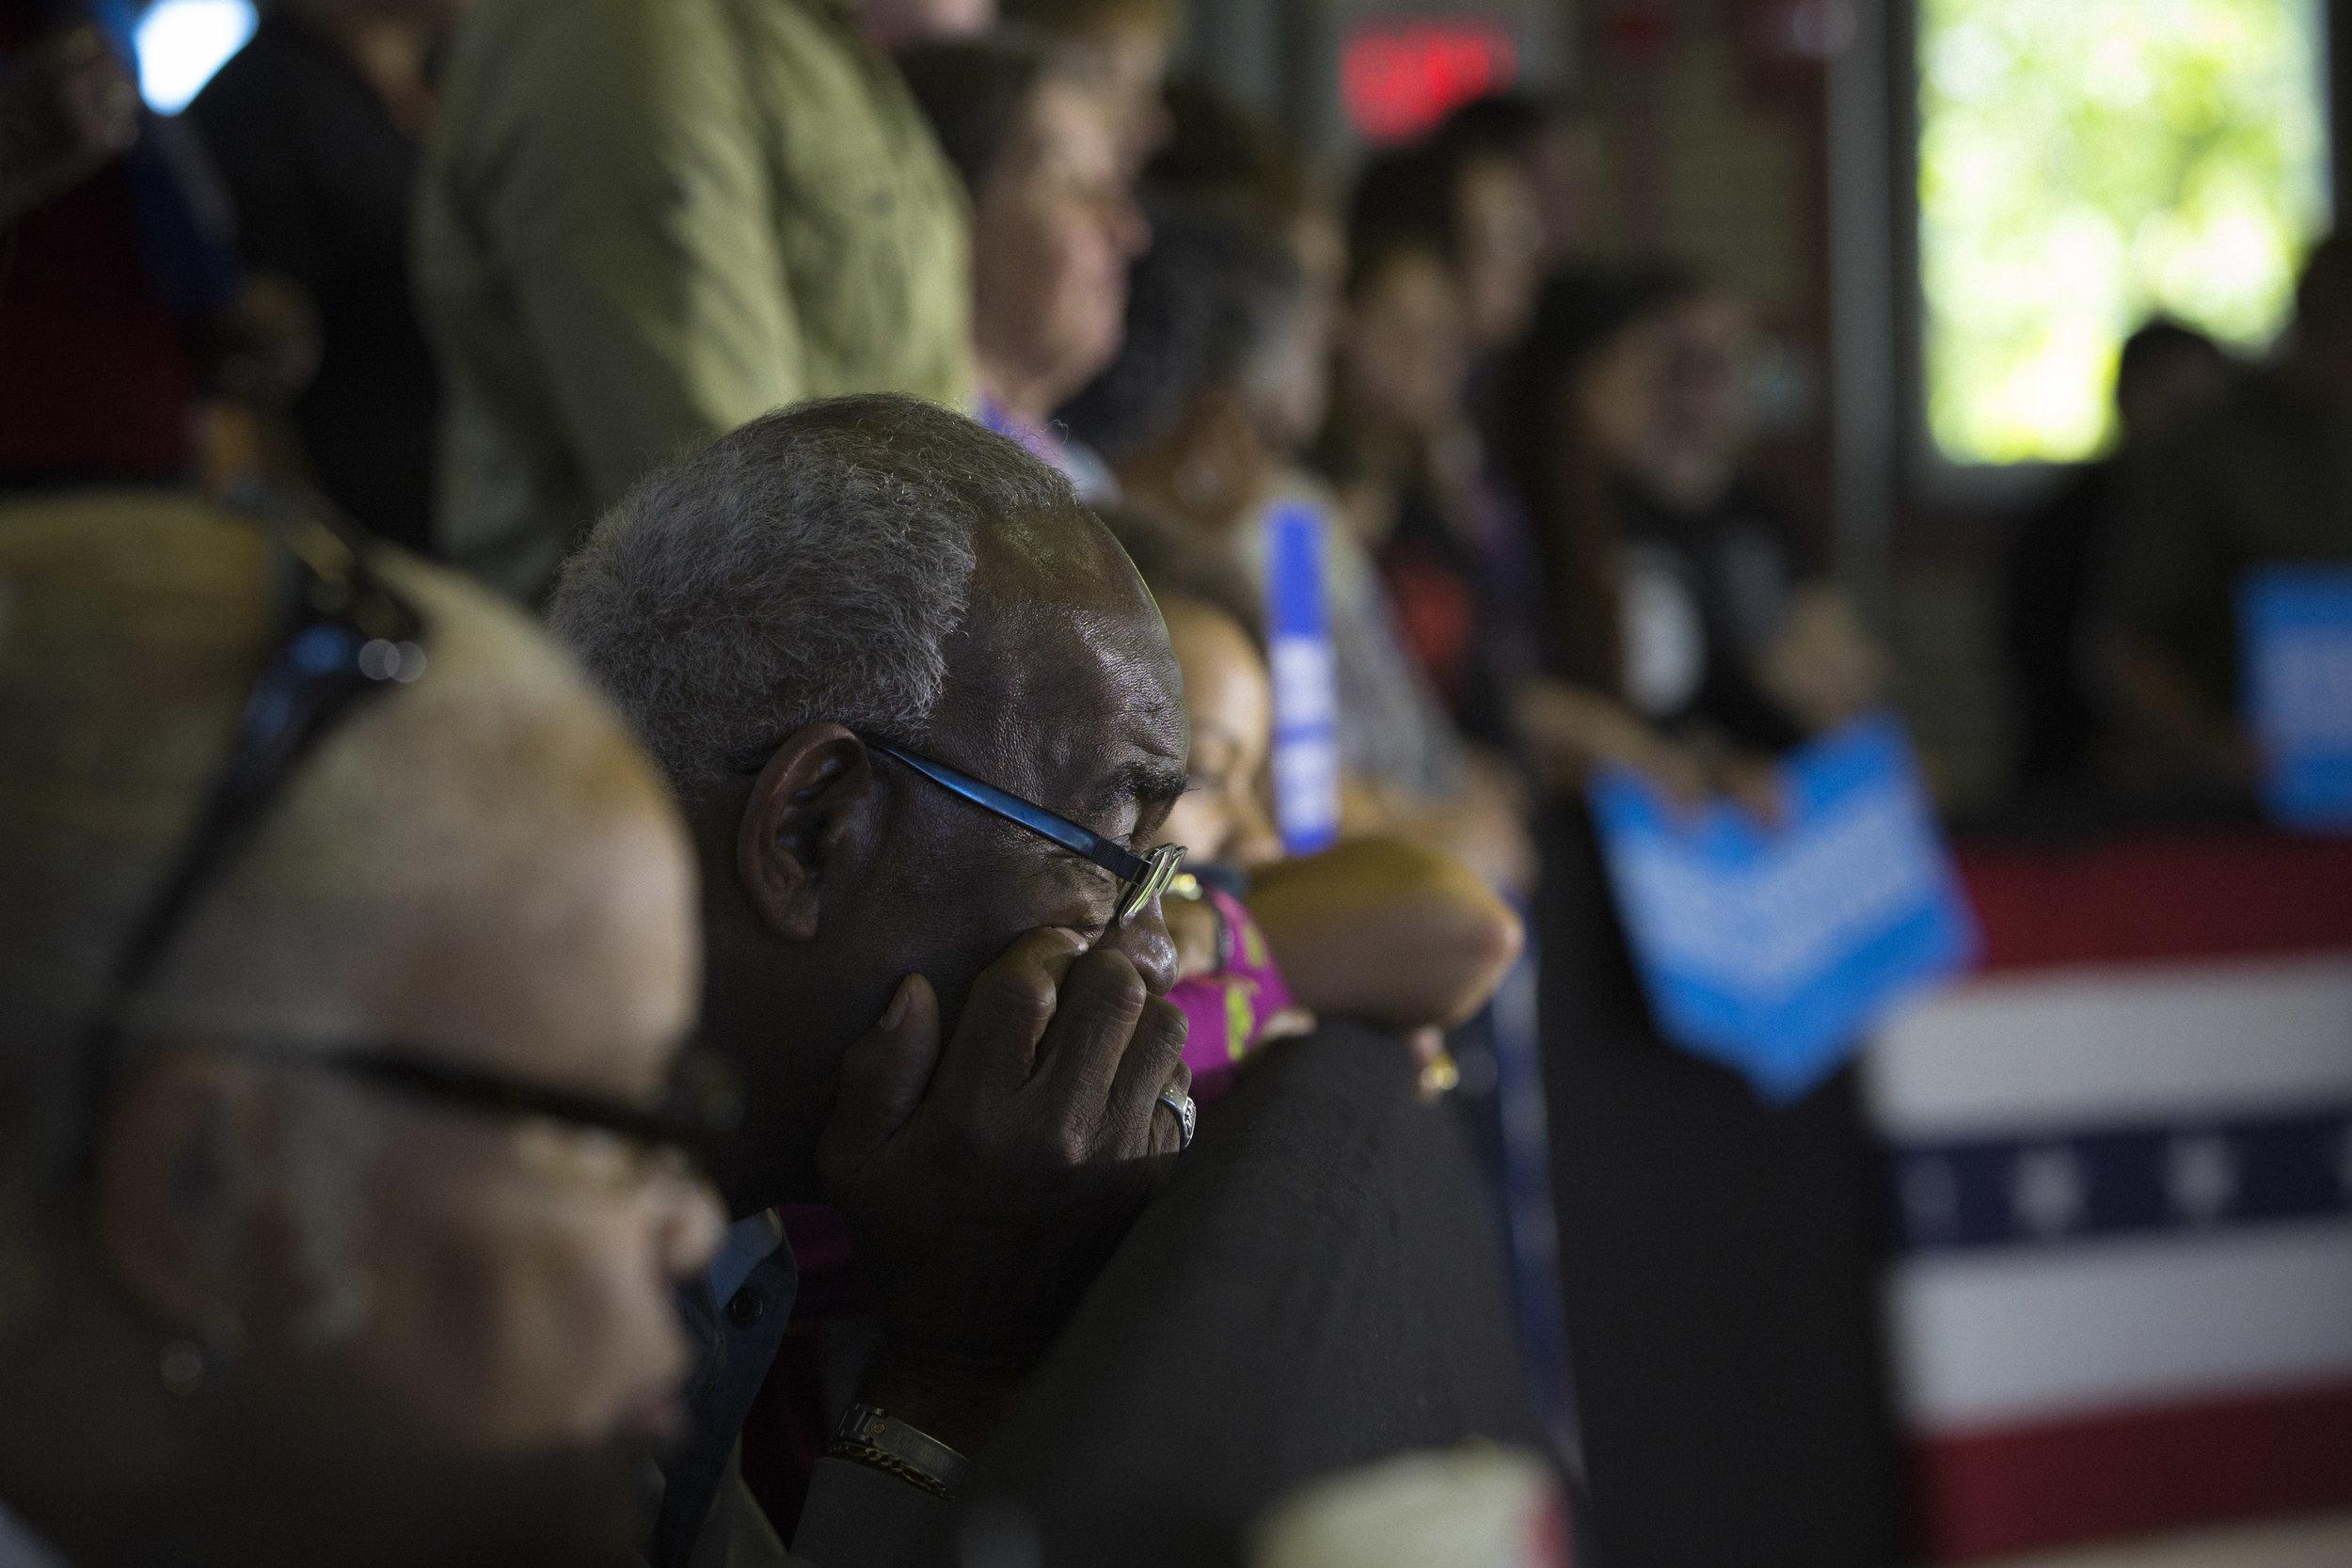 09272016_BJM_Bill_Clinton_in_Toledo_Ohio_06.jpg